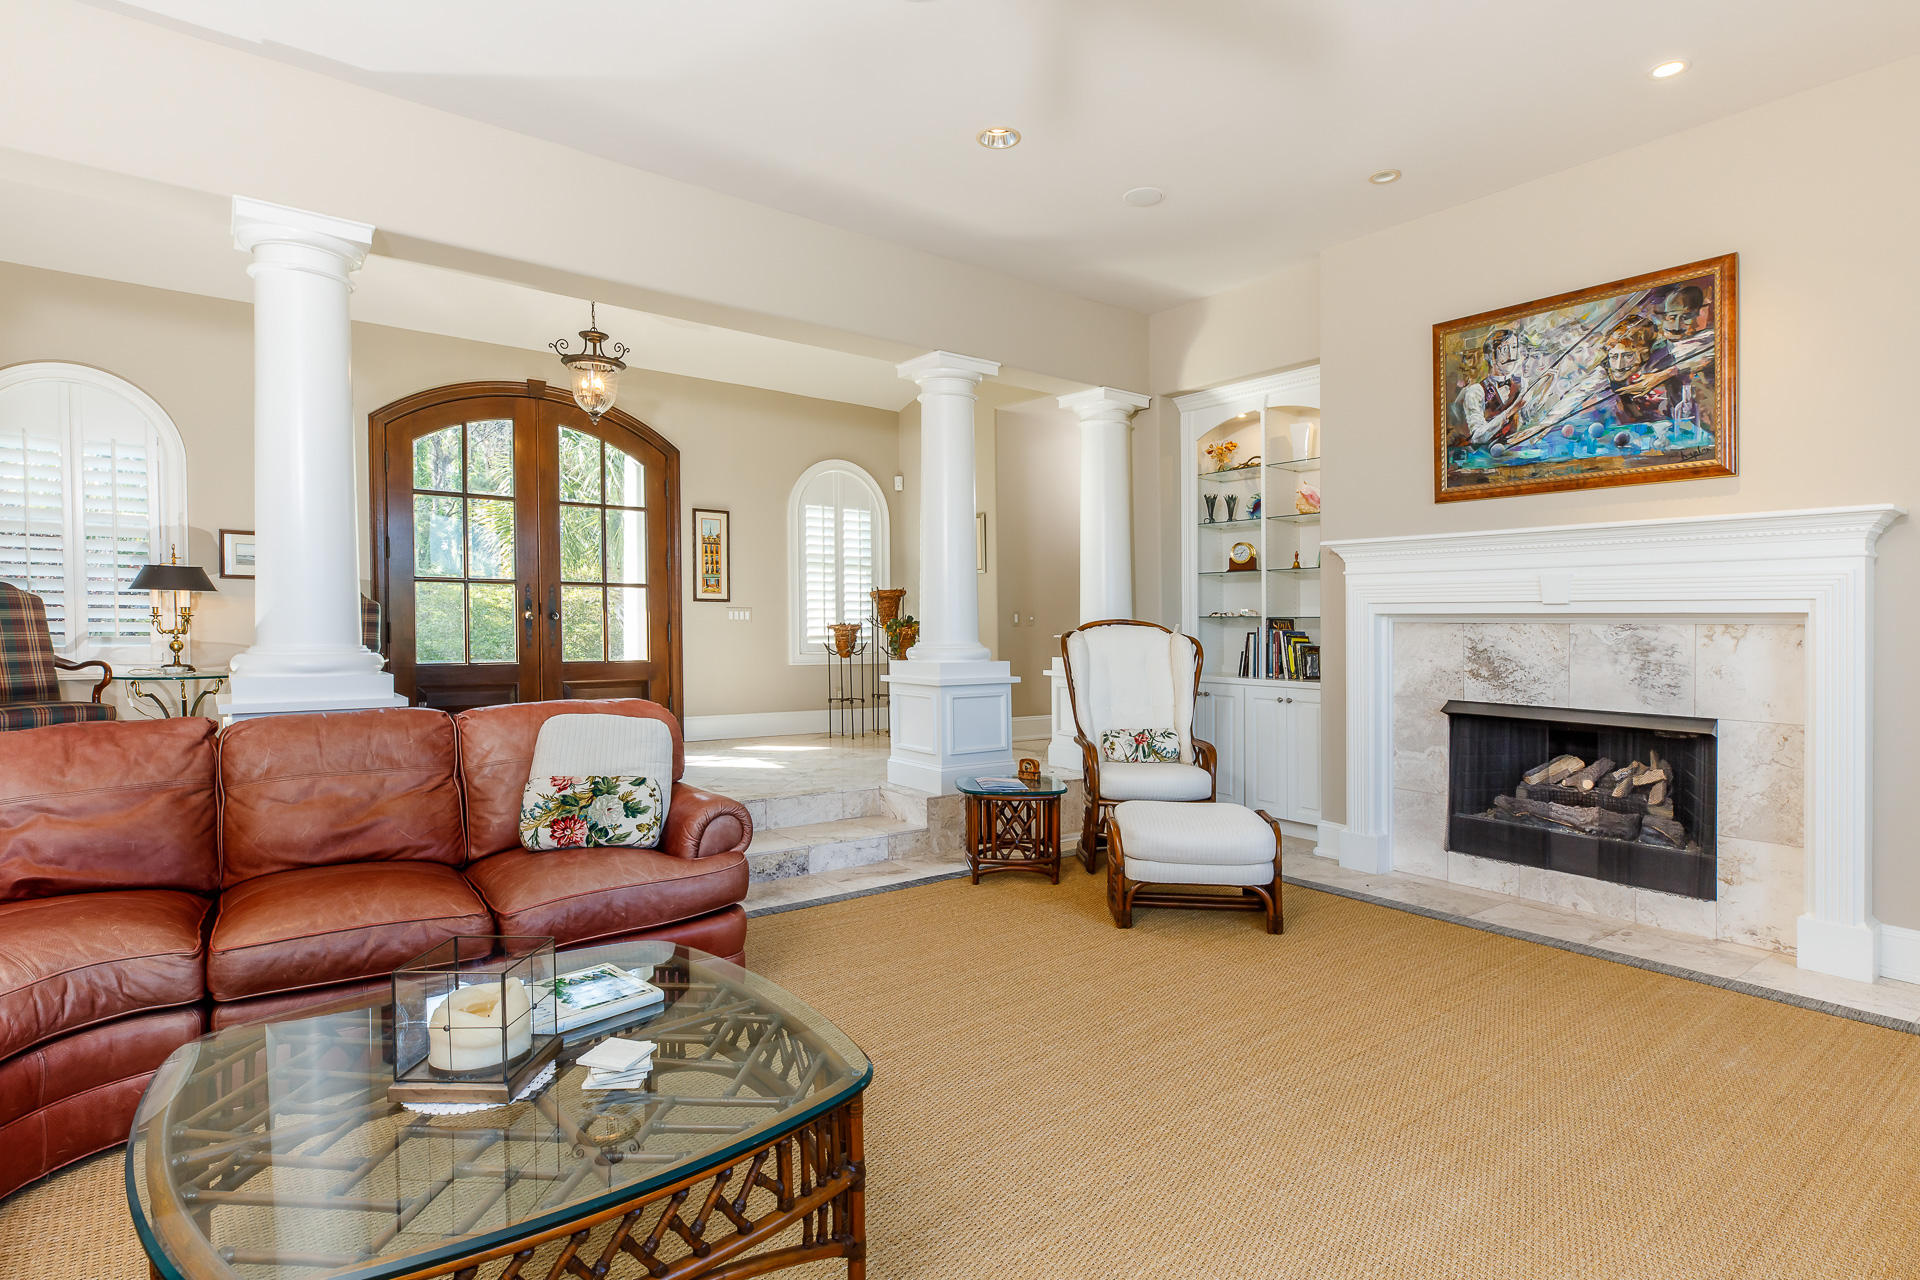 Seabrook Island Homes For Sale - 2216 Rolling Dune, Seabrook Island, SC - 50